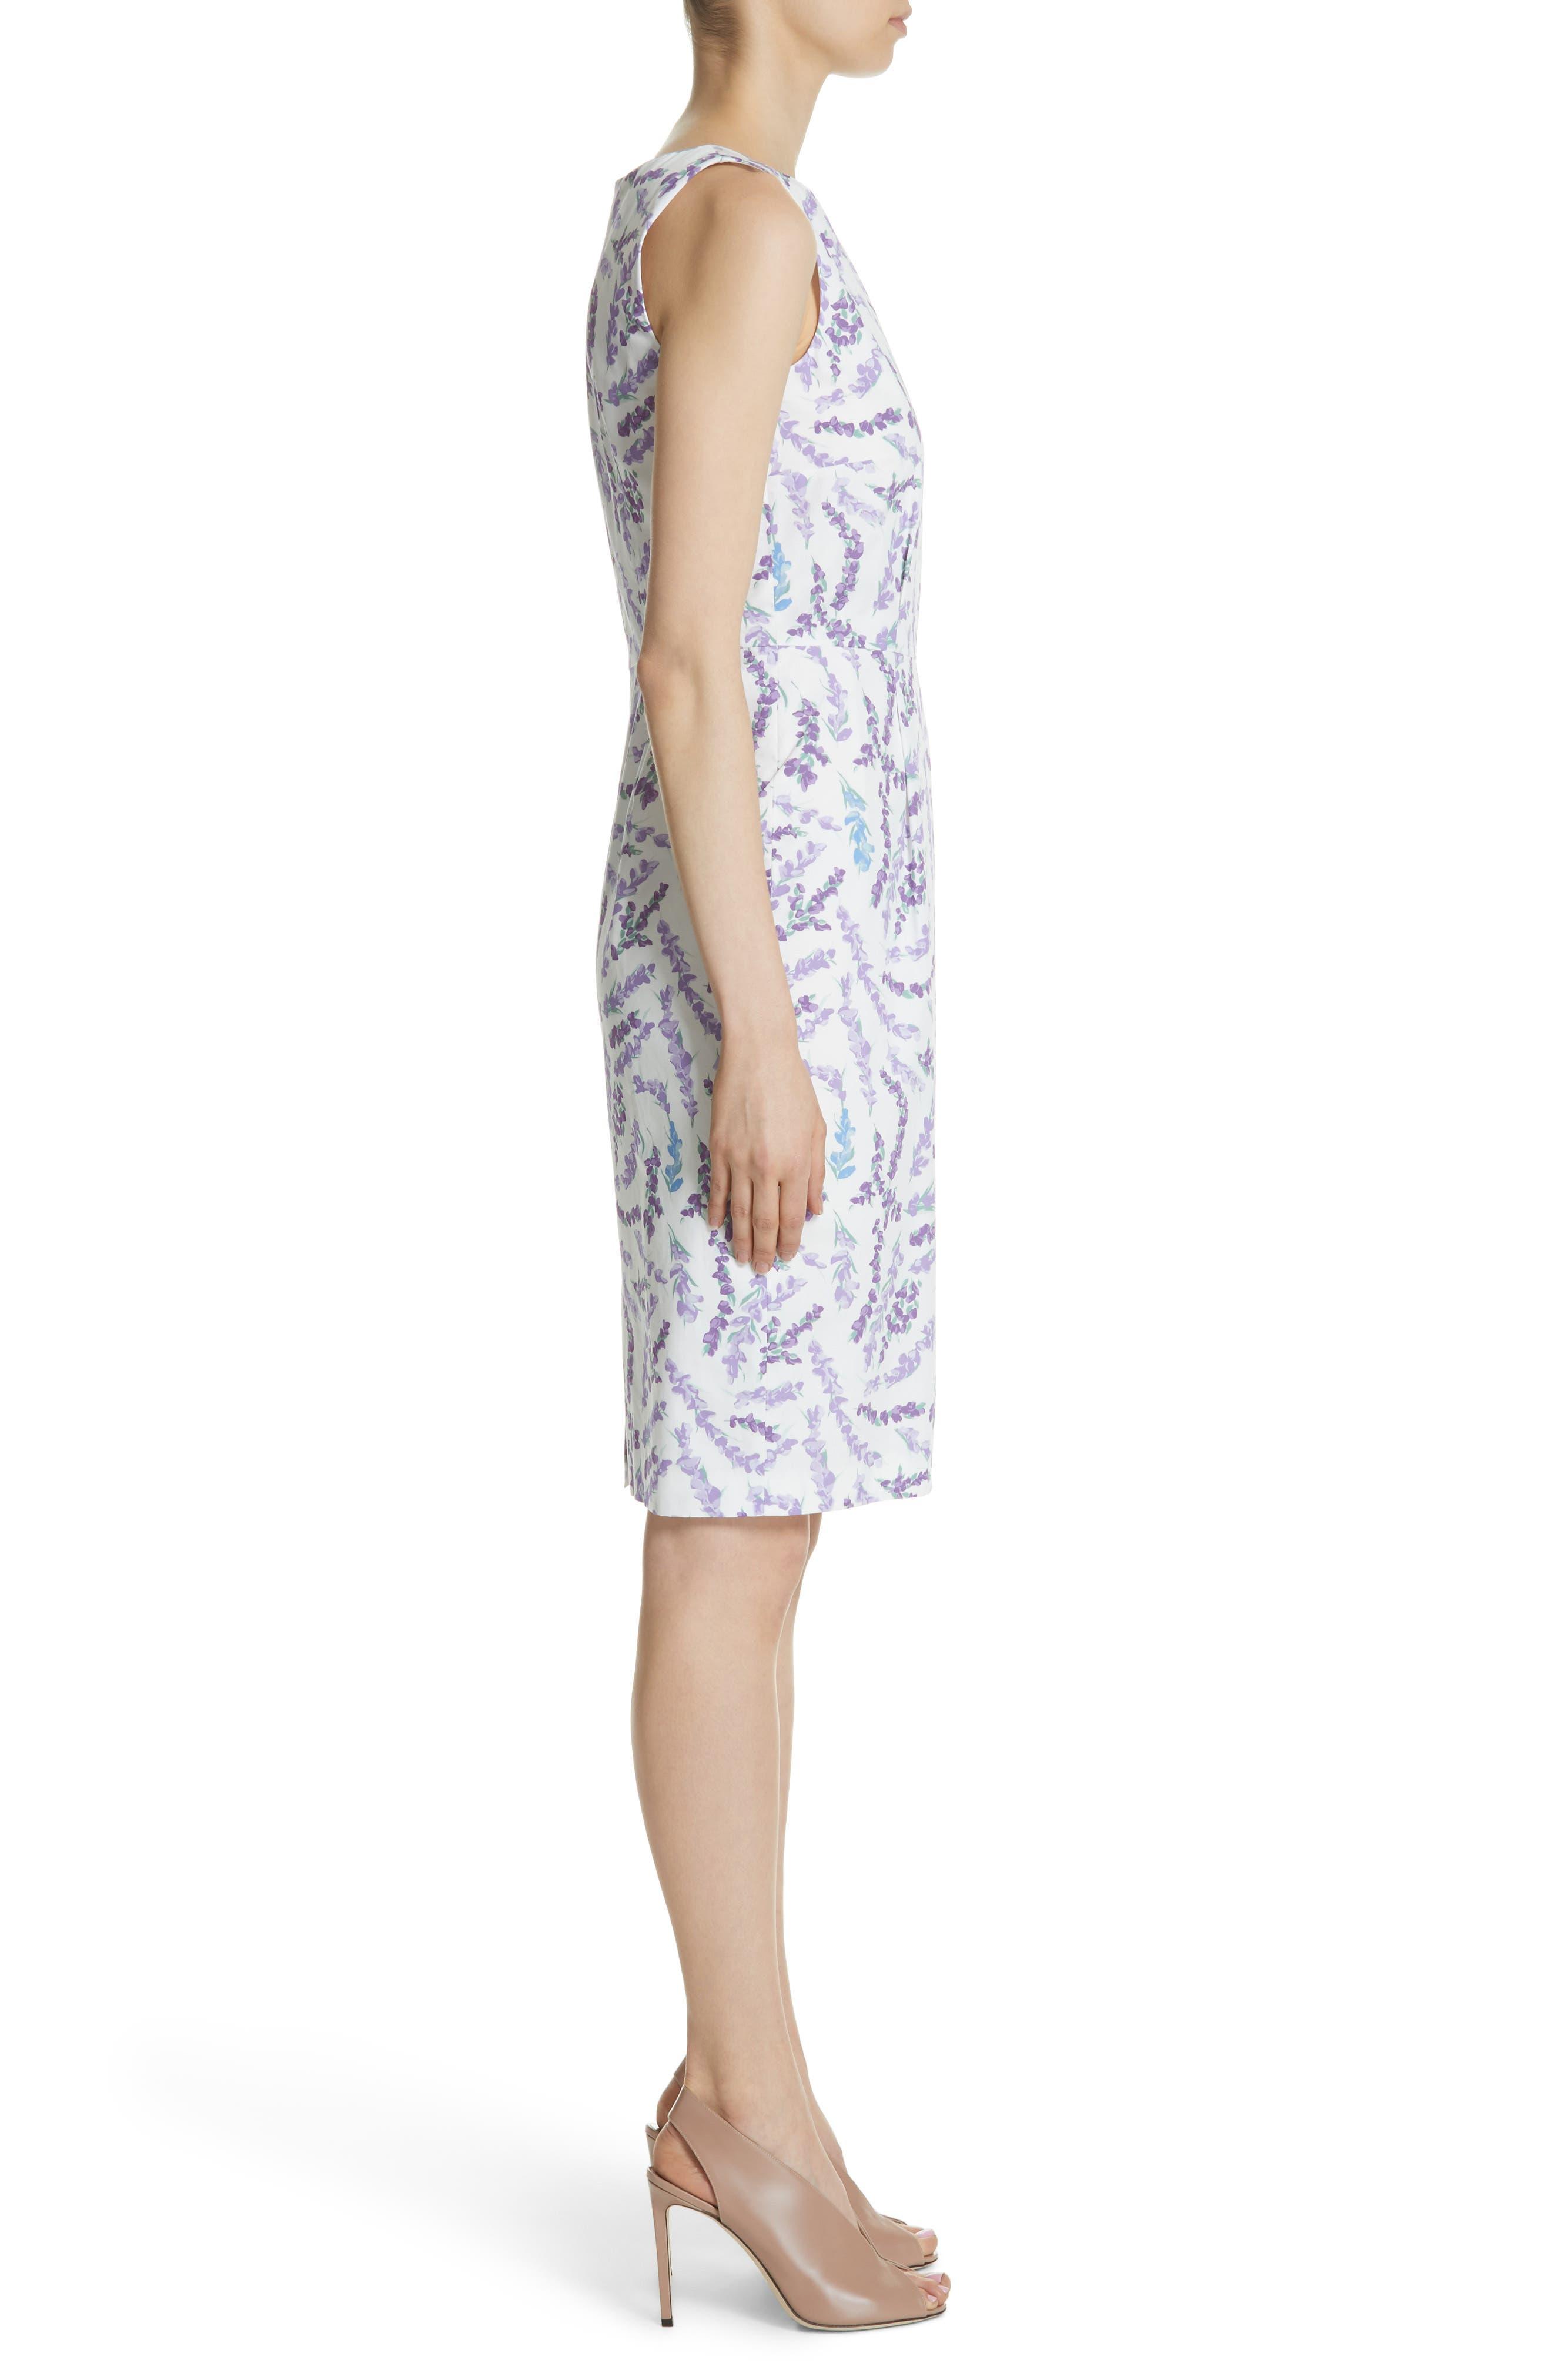 Melfi Print Cotton Sheath Dress,                             Alternate thumbnail 3, color,                             Lavender